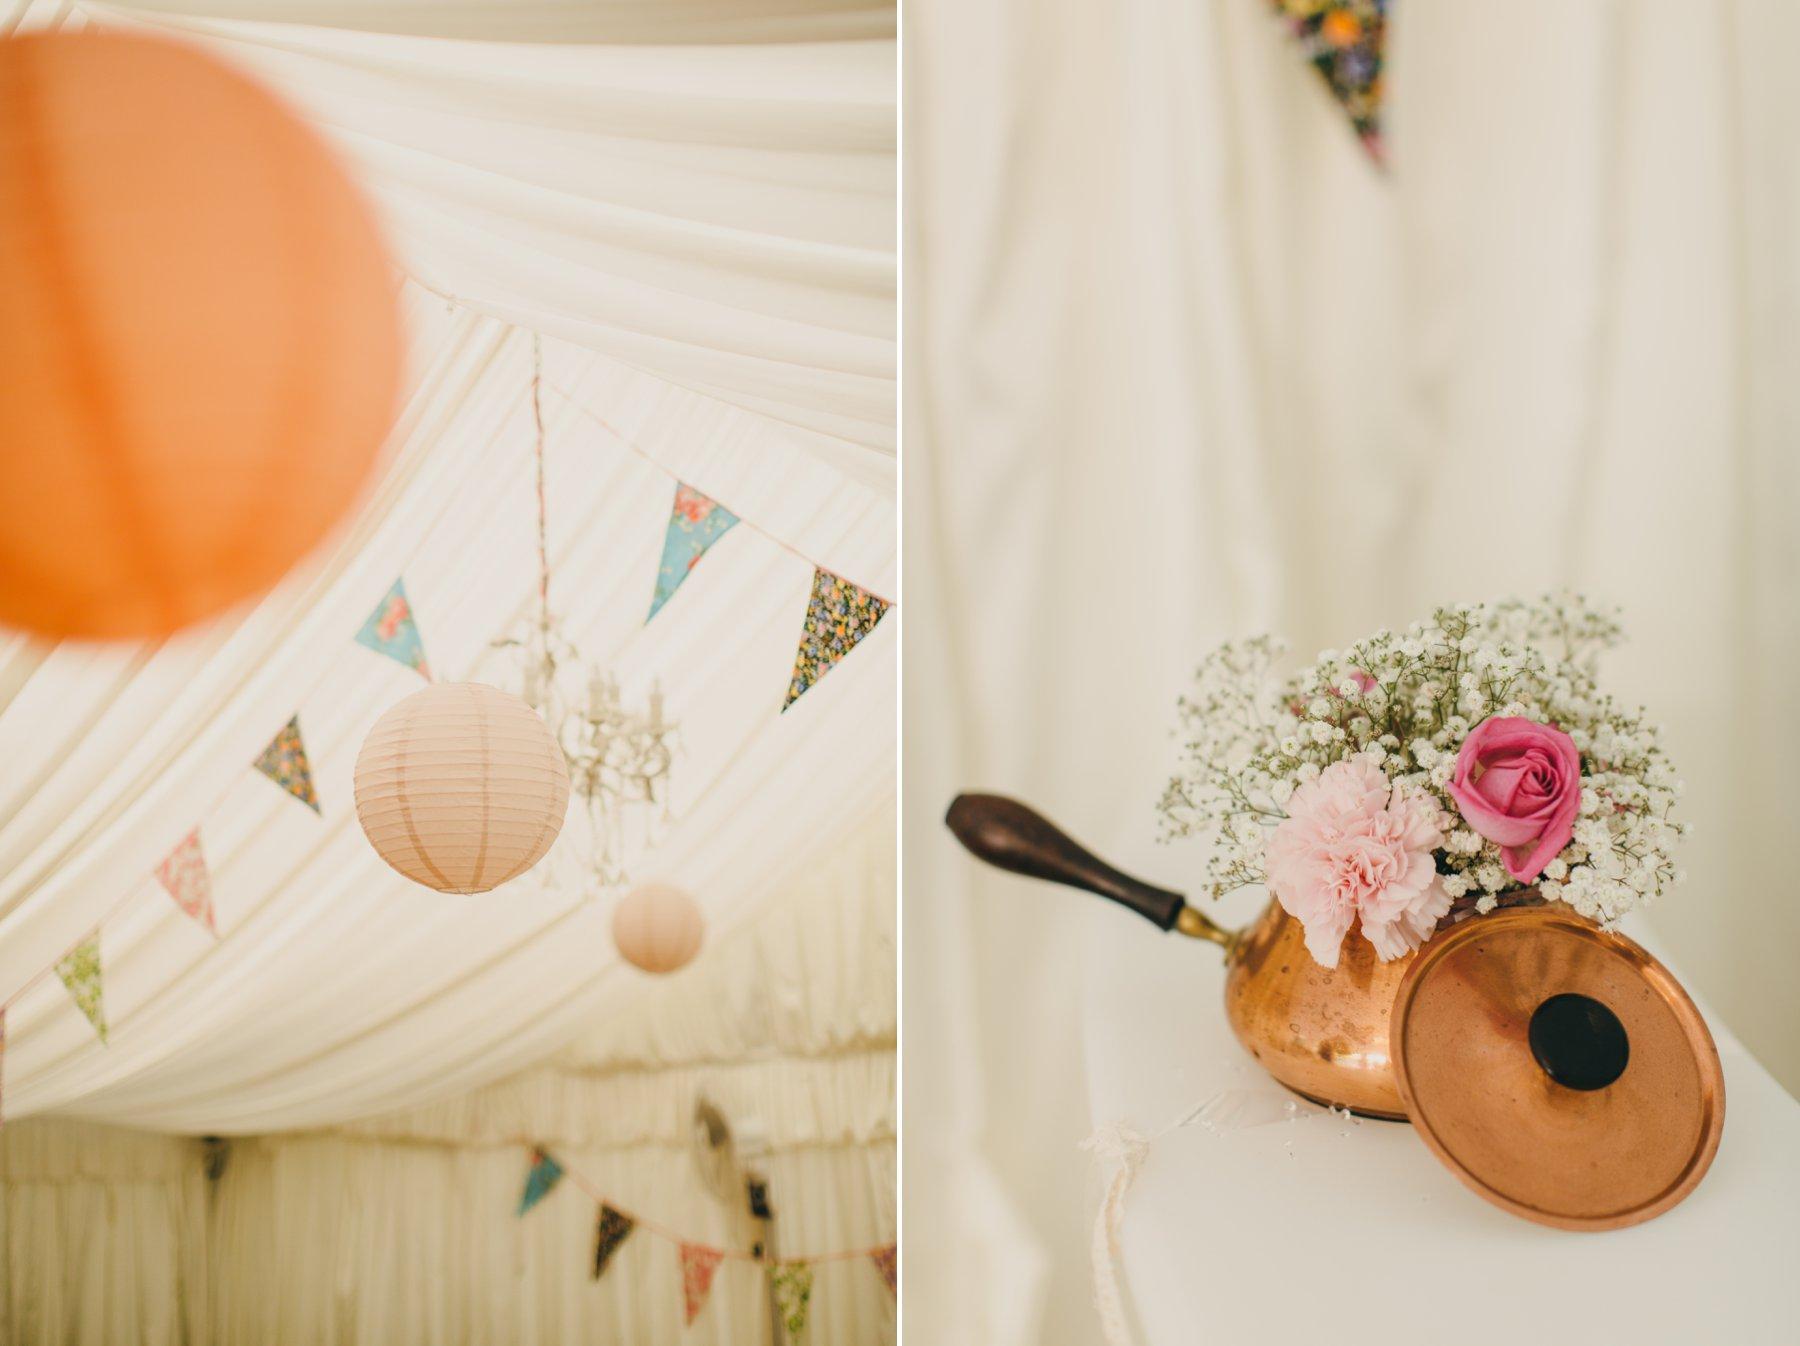 petitmoulin_france_bordeaux_weddings_0105